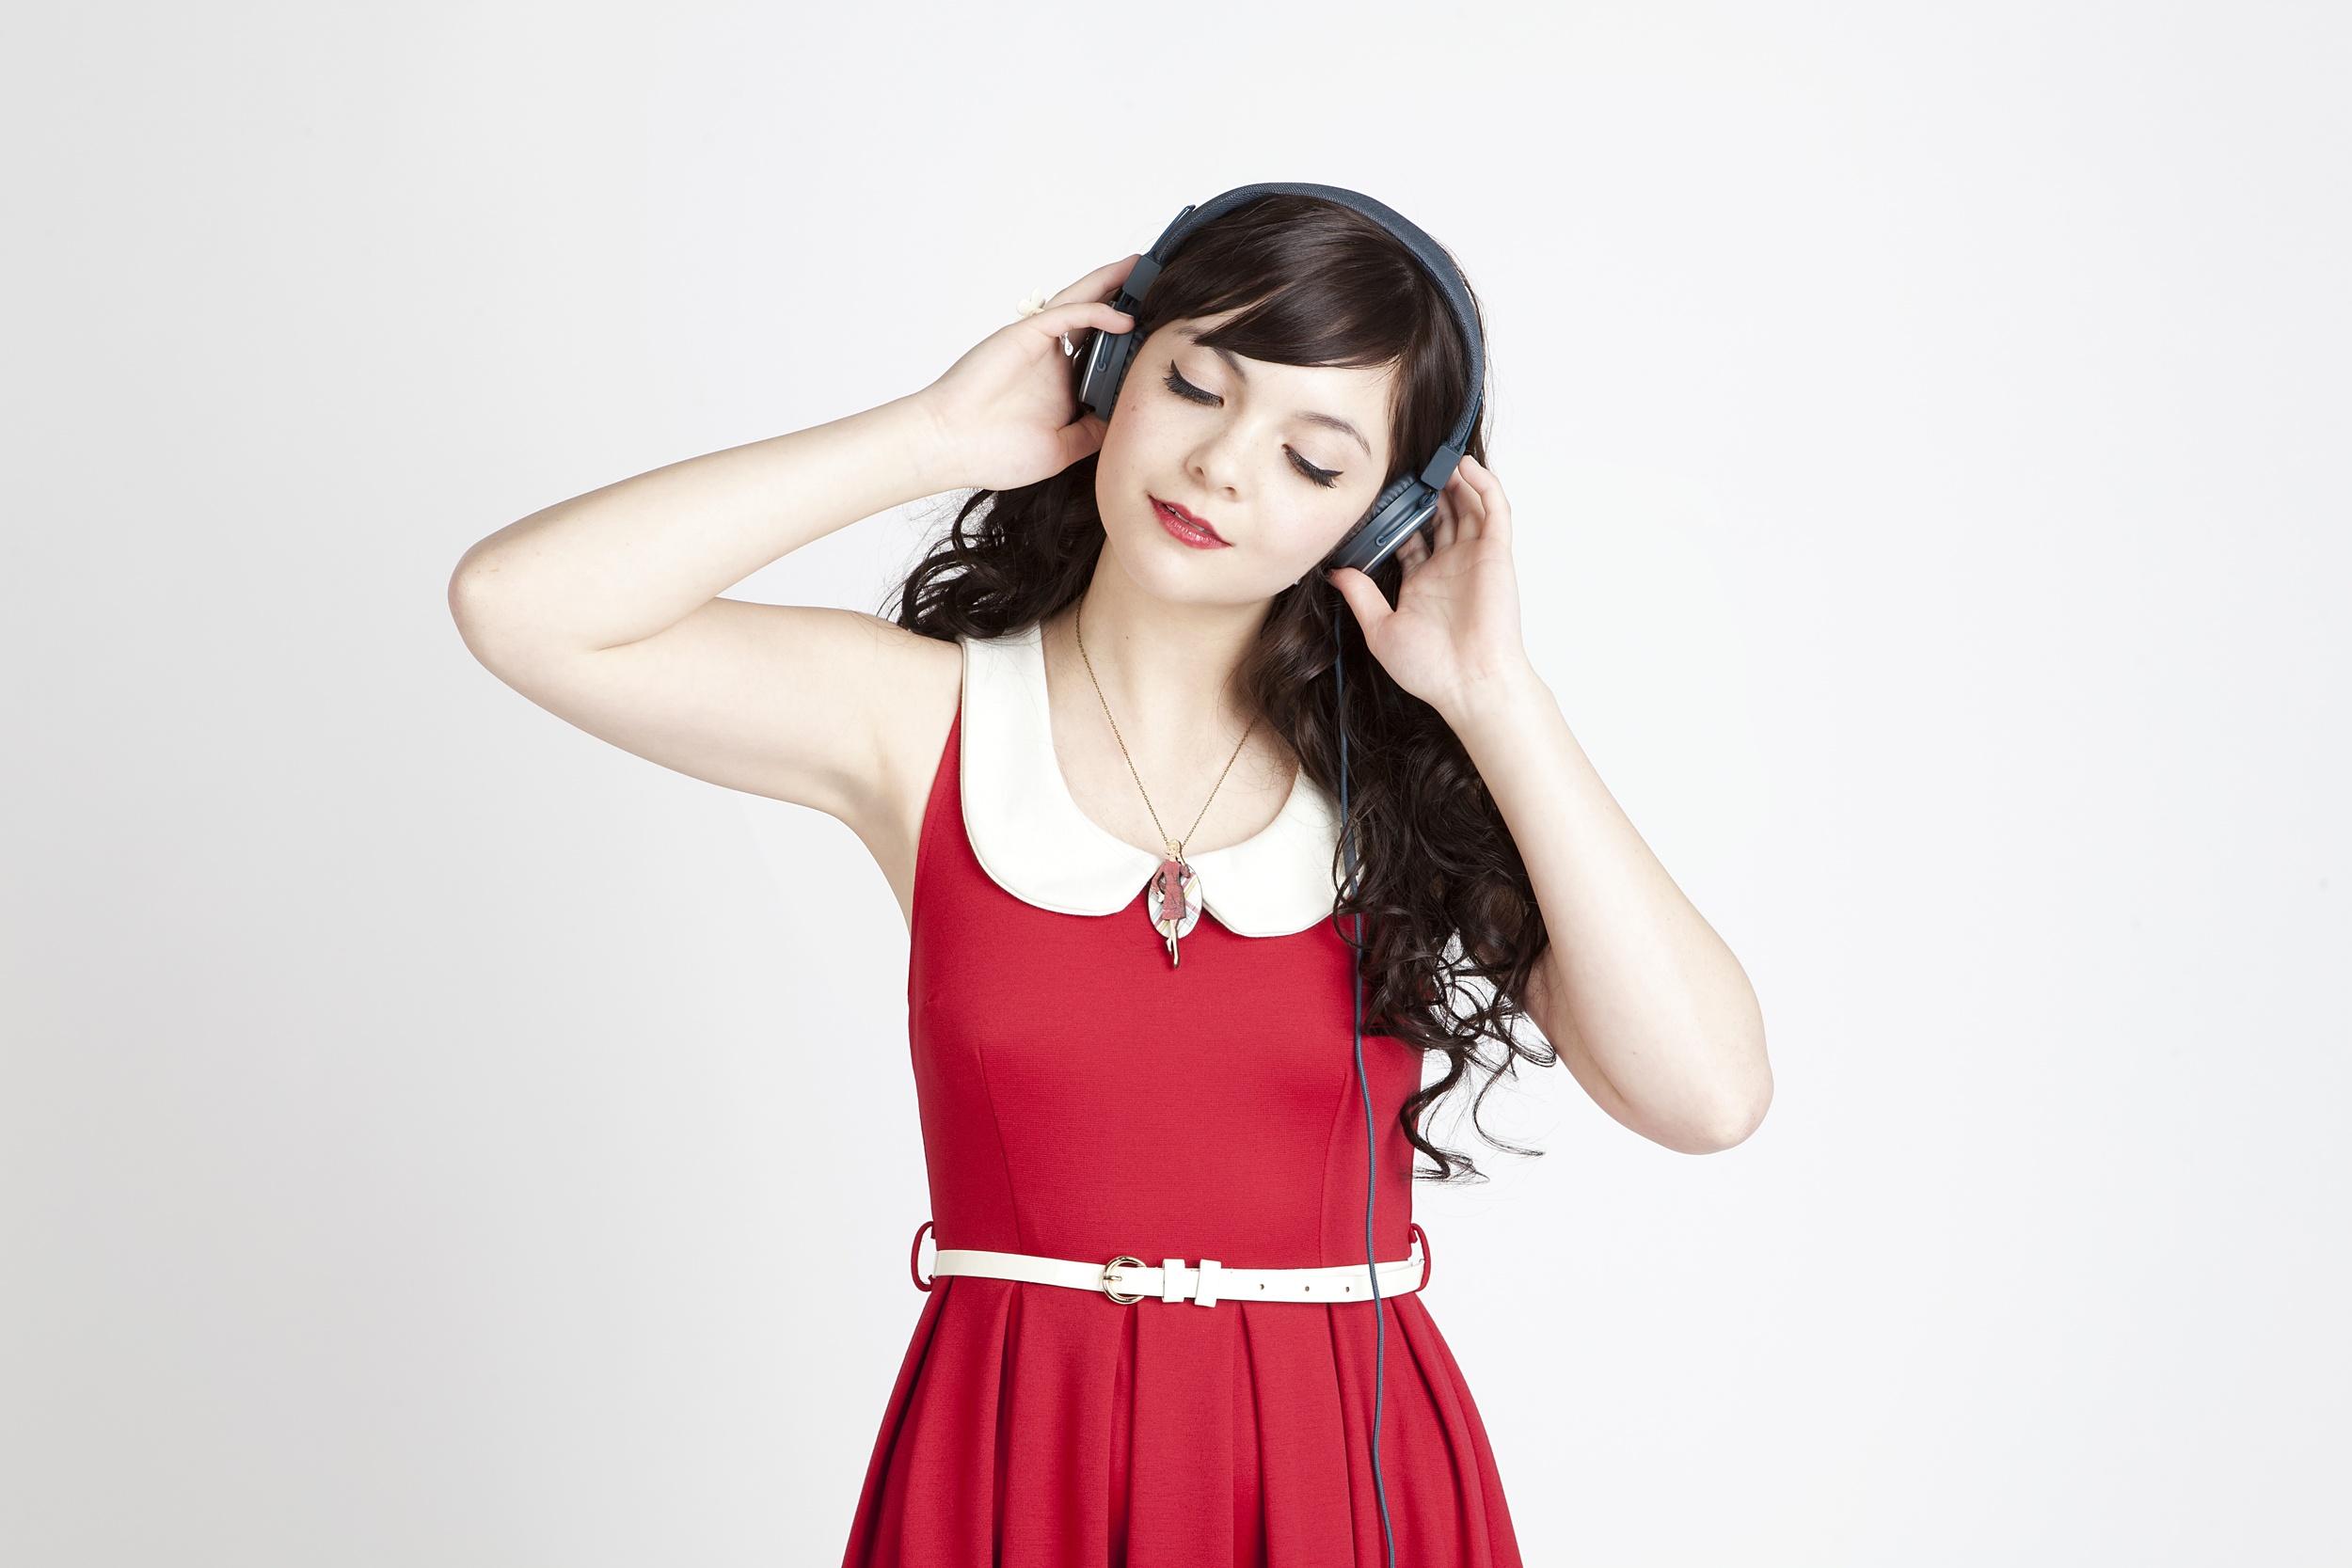 MC_lily_headphones.jpg